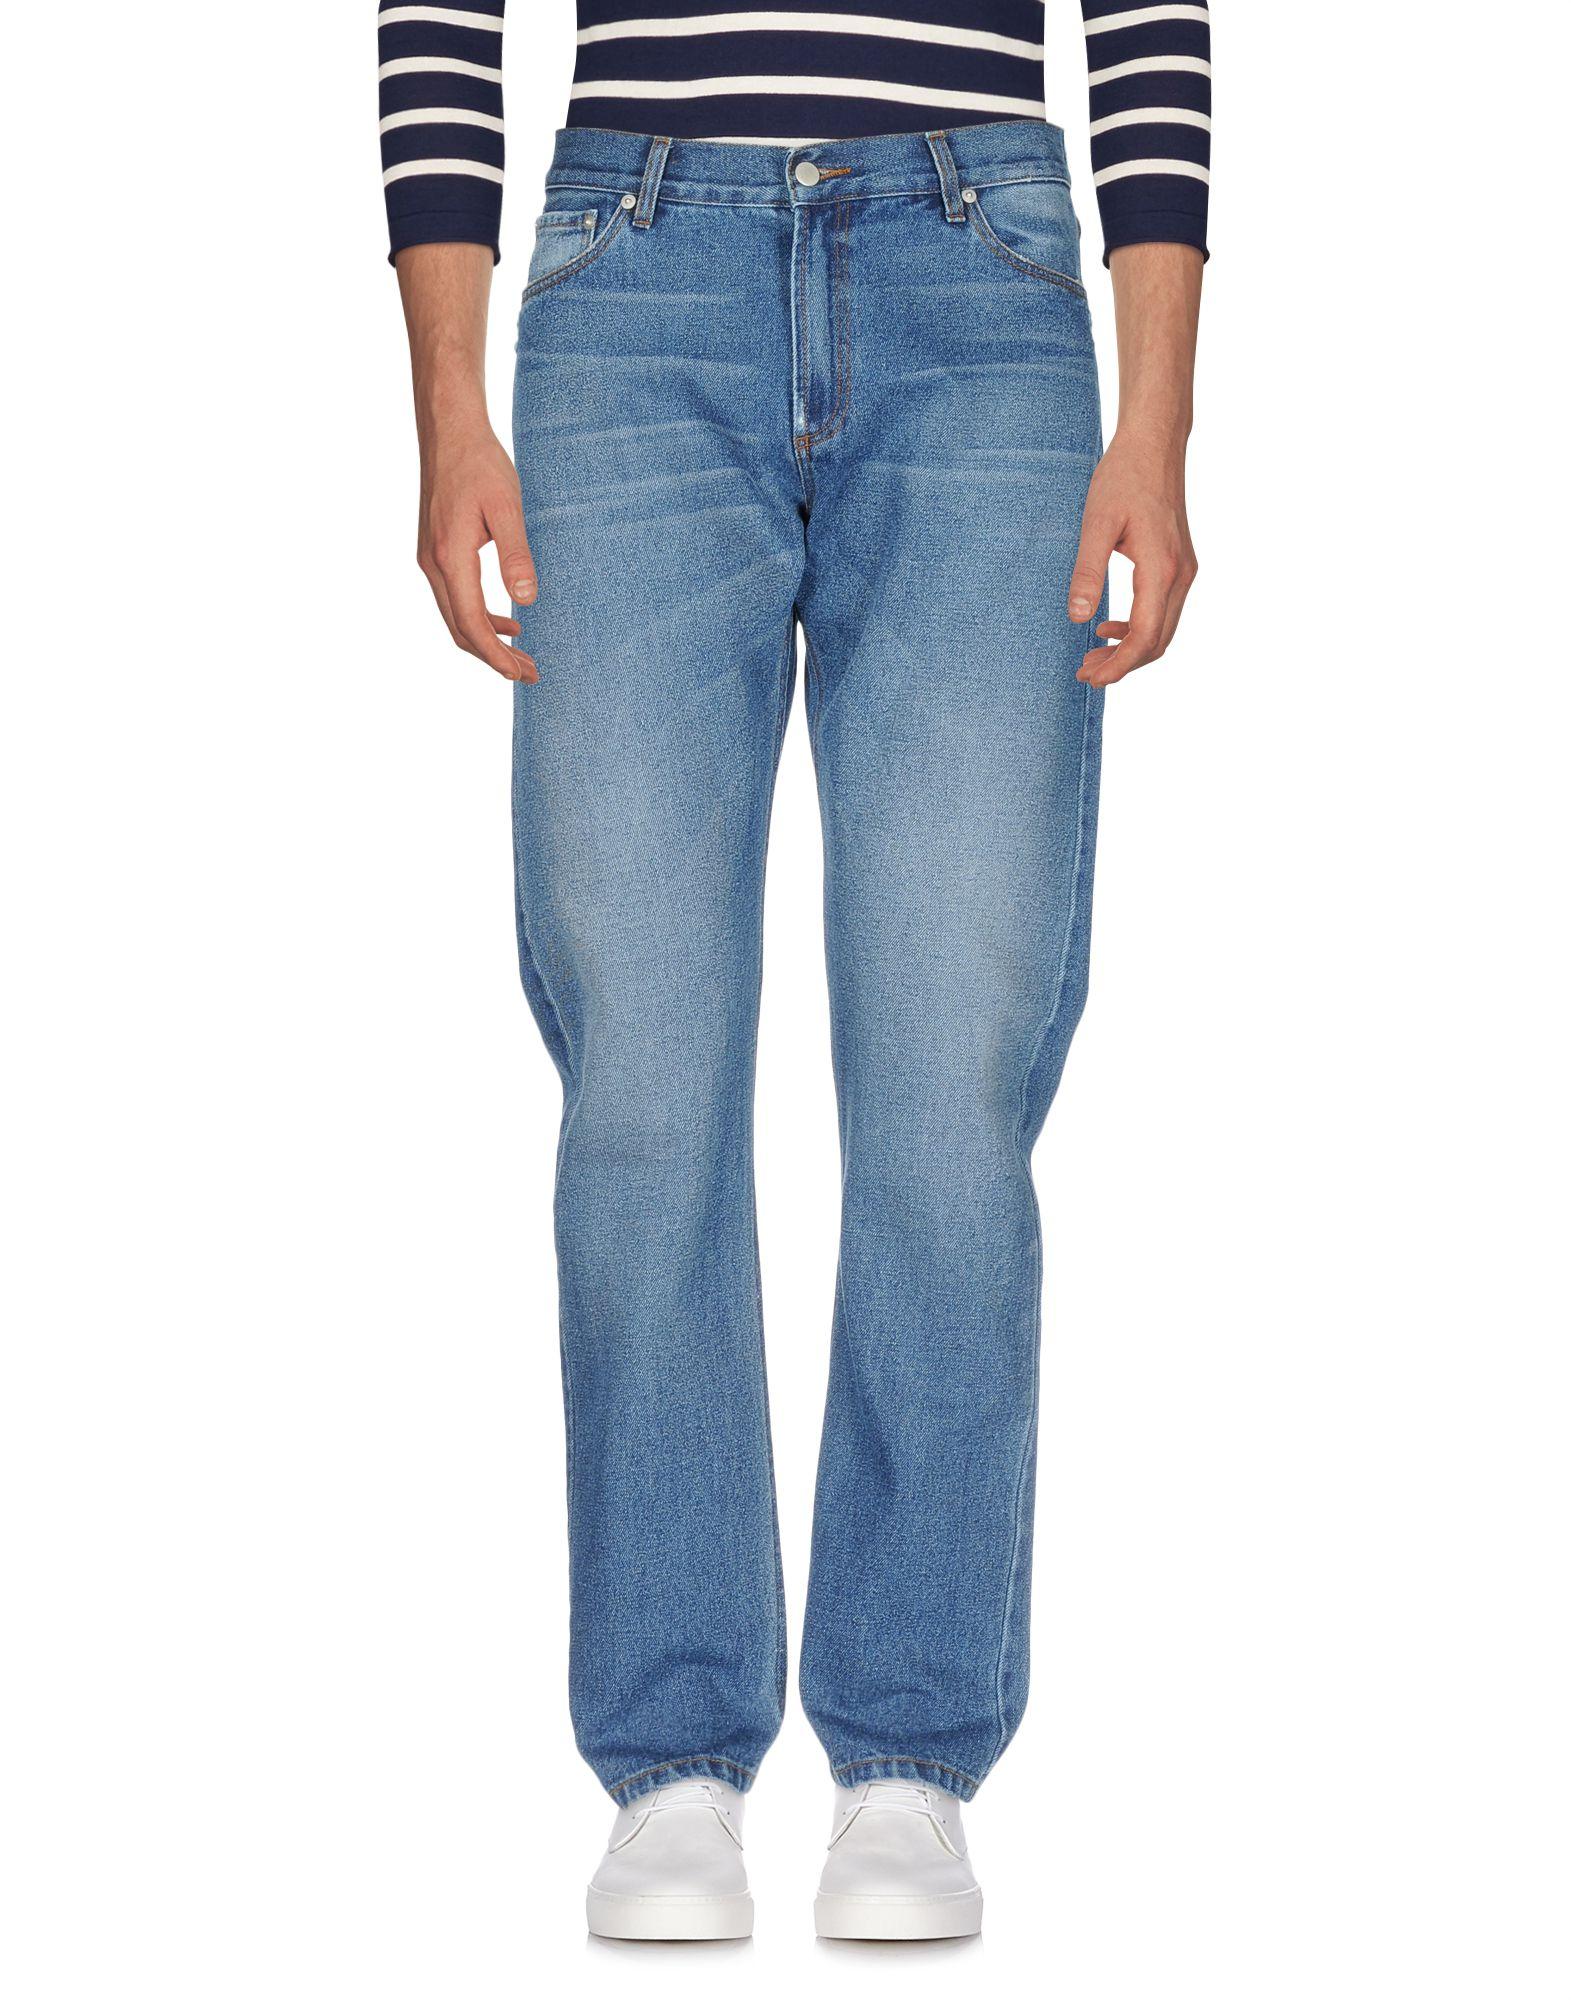 CMMN SWDN Джинсовые брюки женские брюки лэйт светлый размер 56